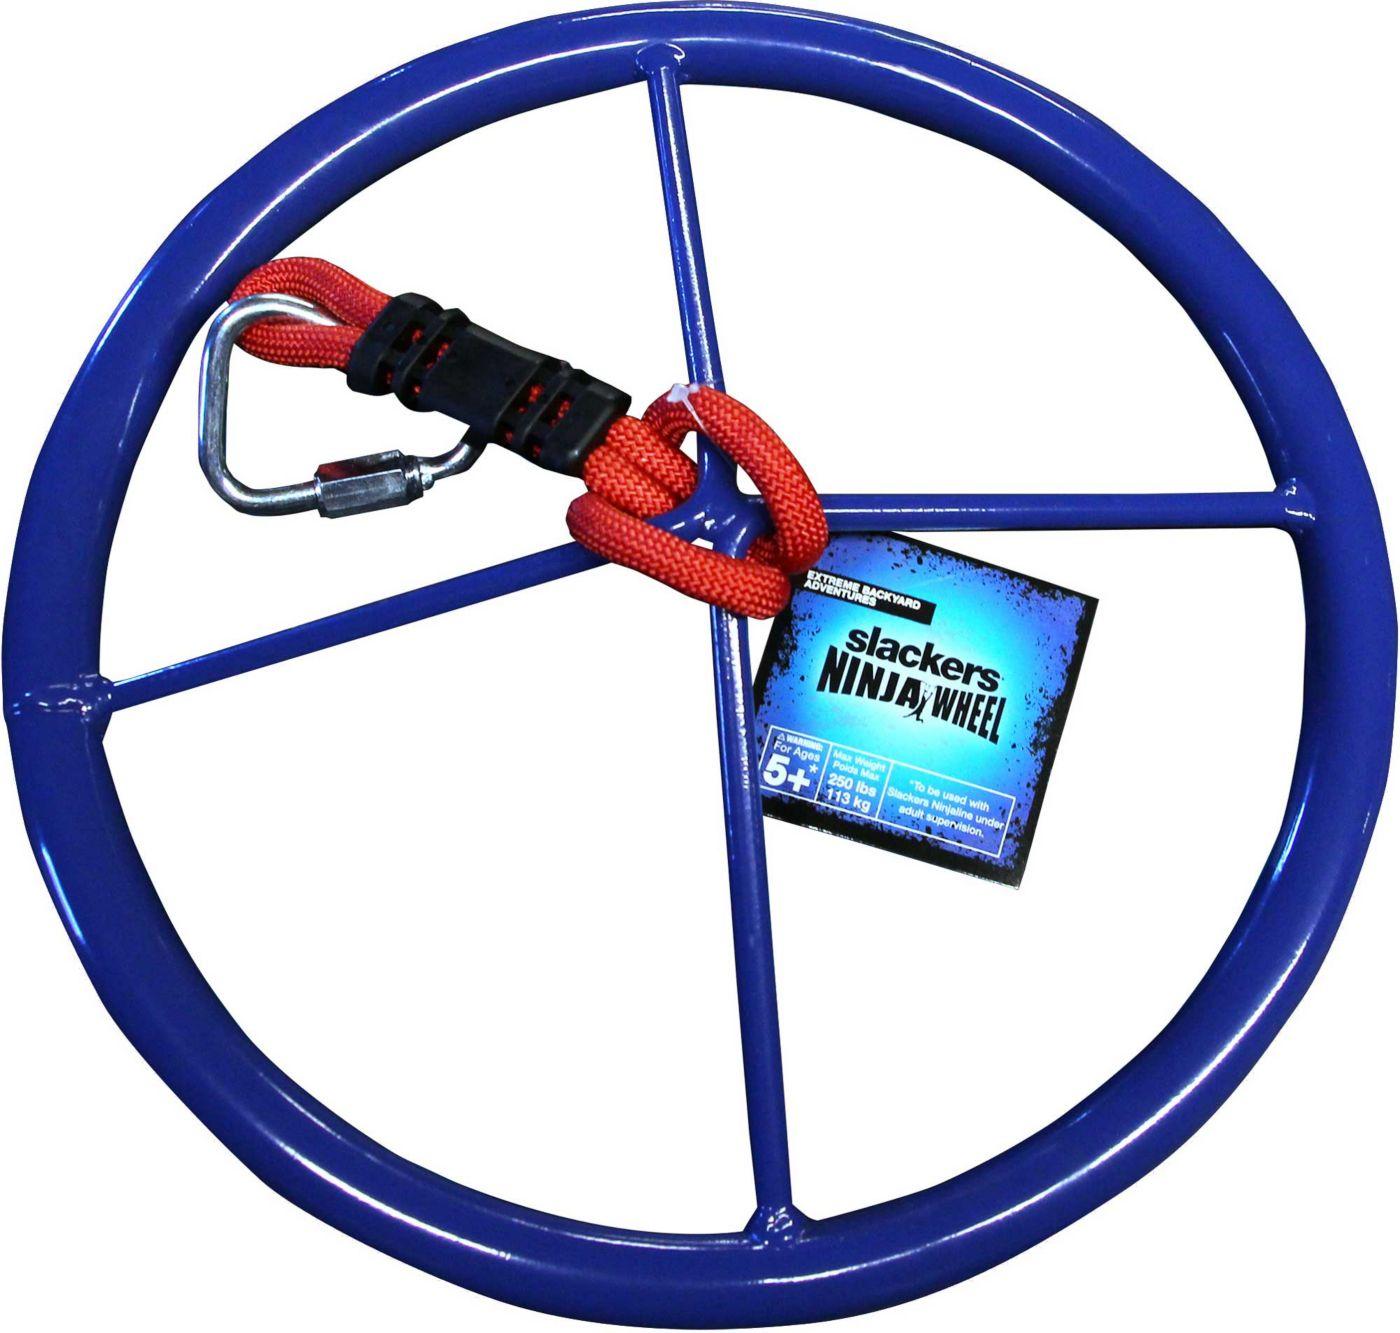 Slackers Ninja Wheel